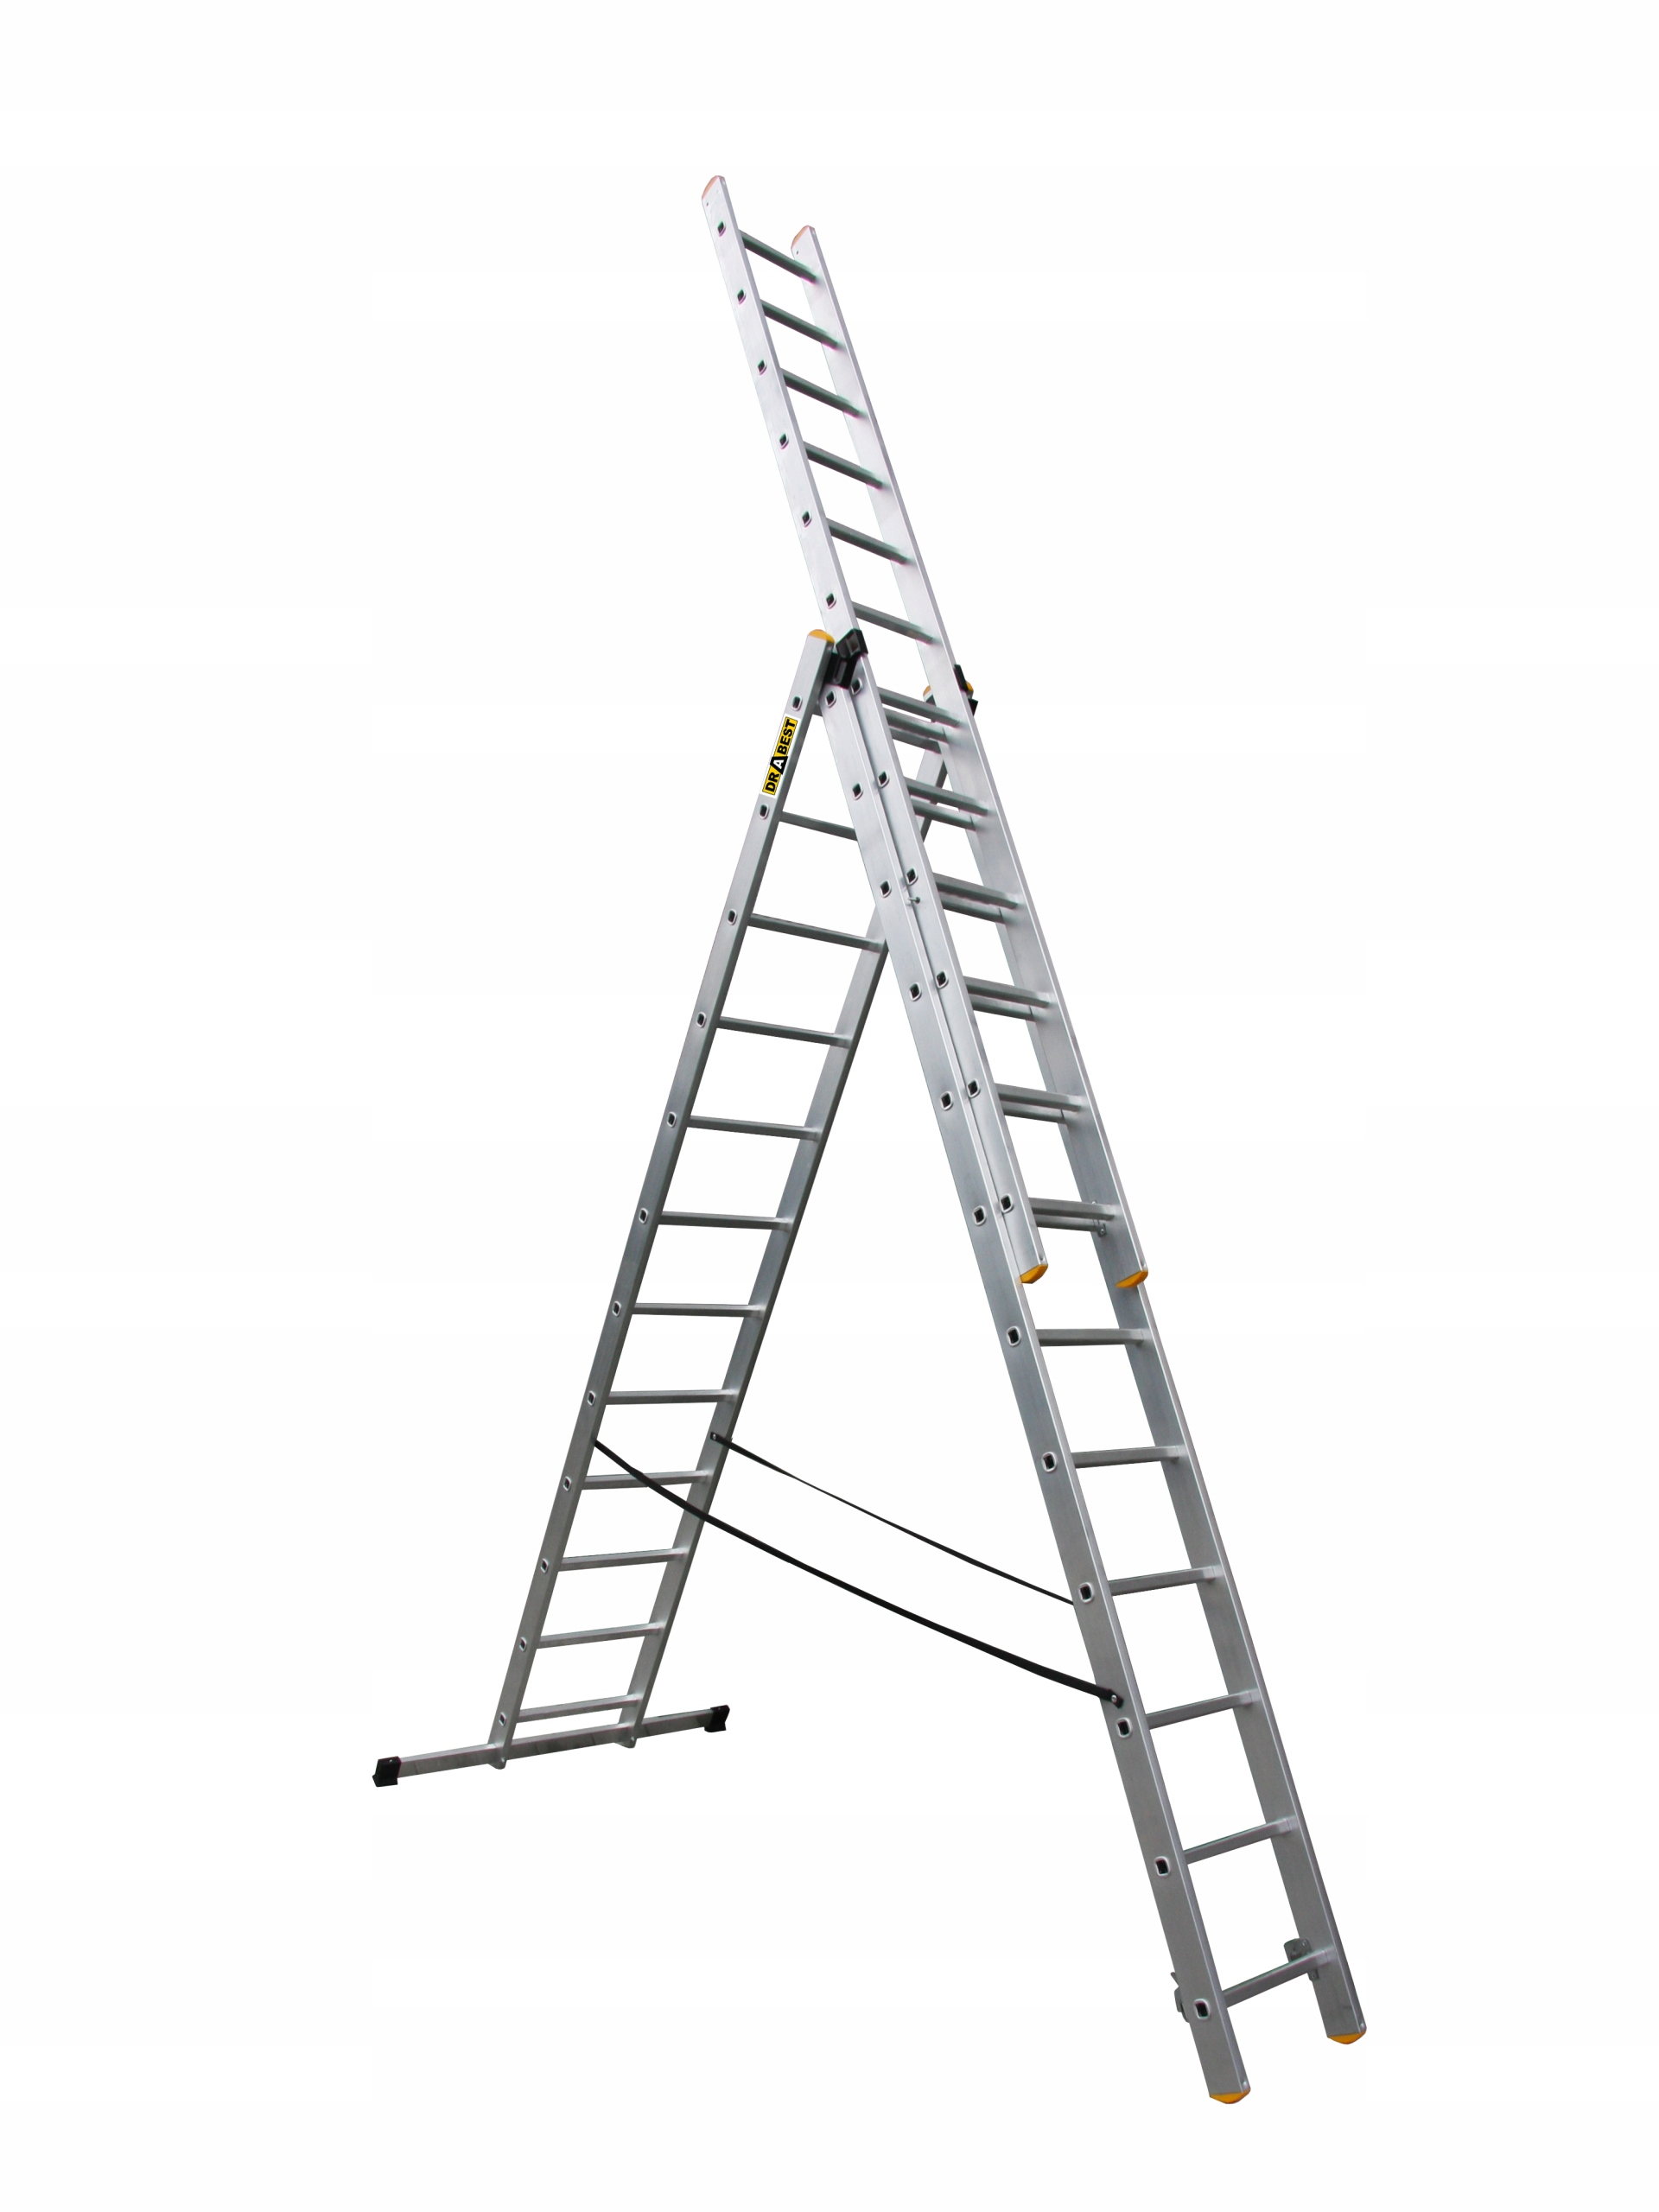 Drabina aluminiowa 3x12 NA SCHODY PROFESJONALNA